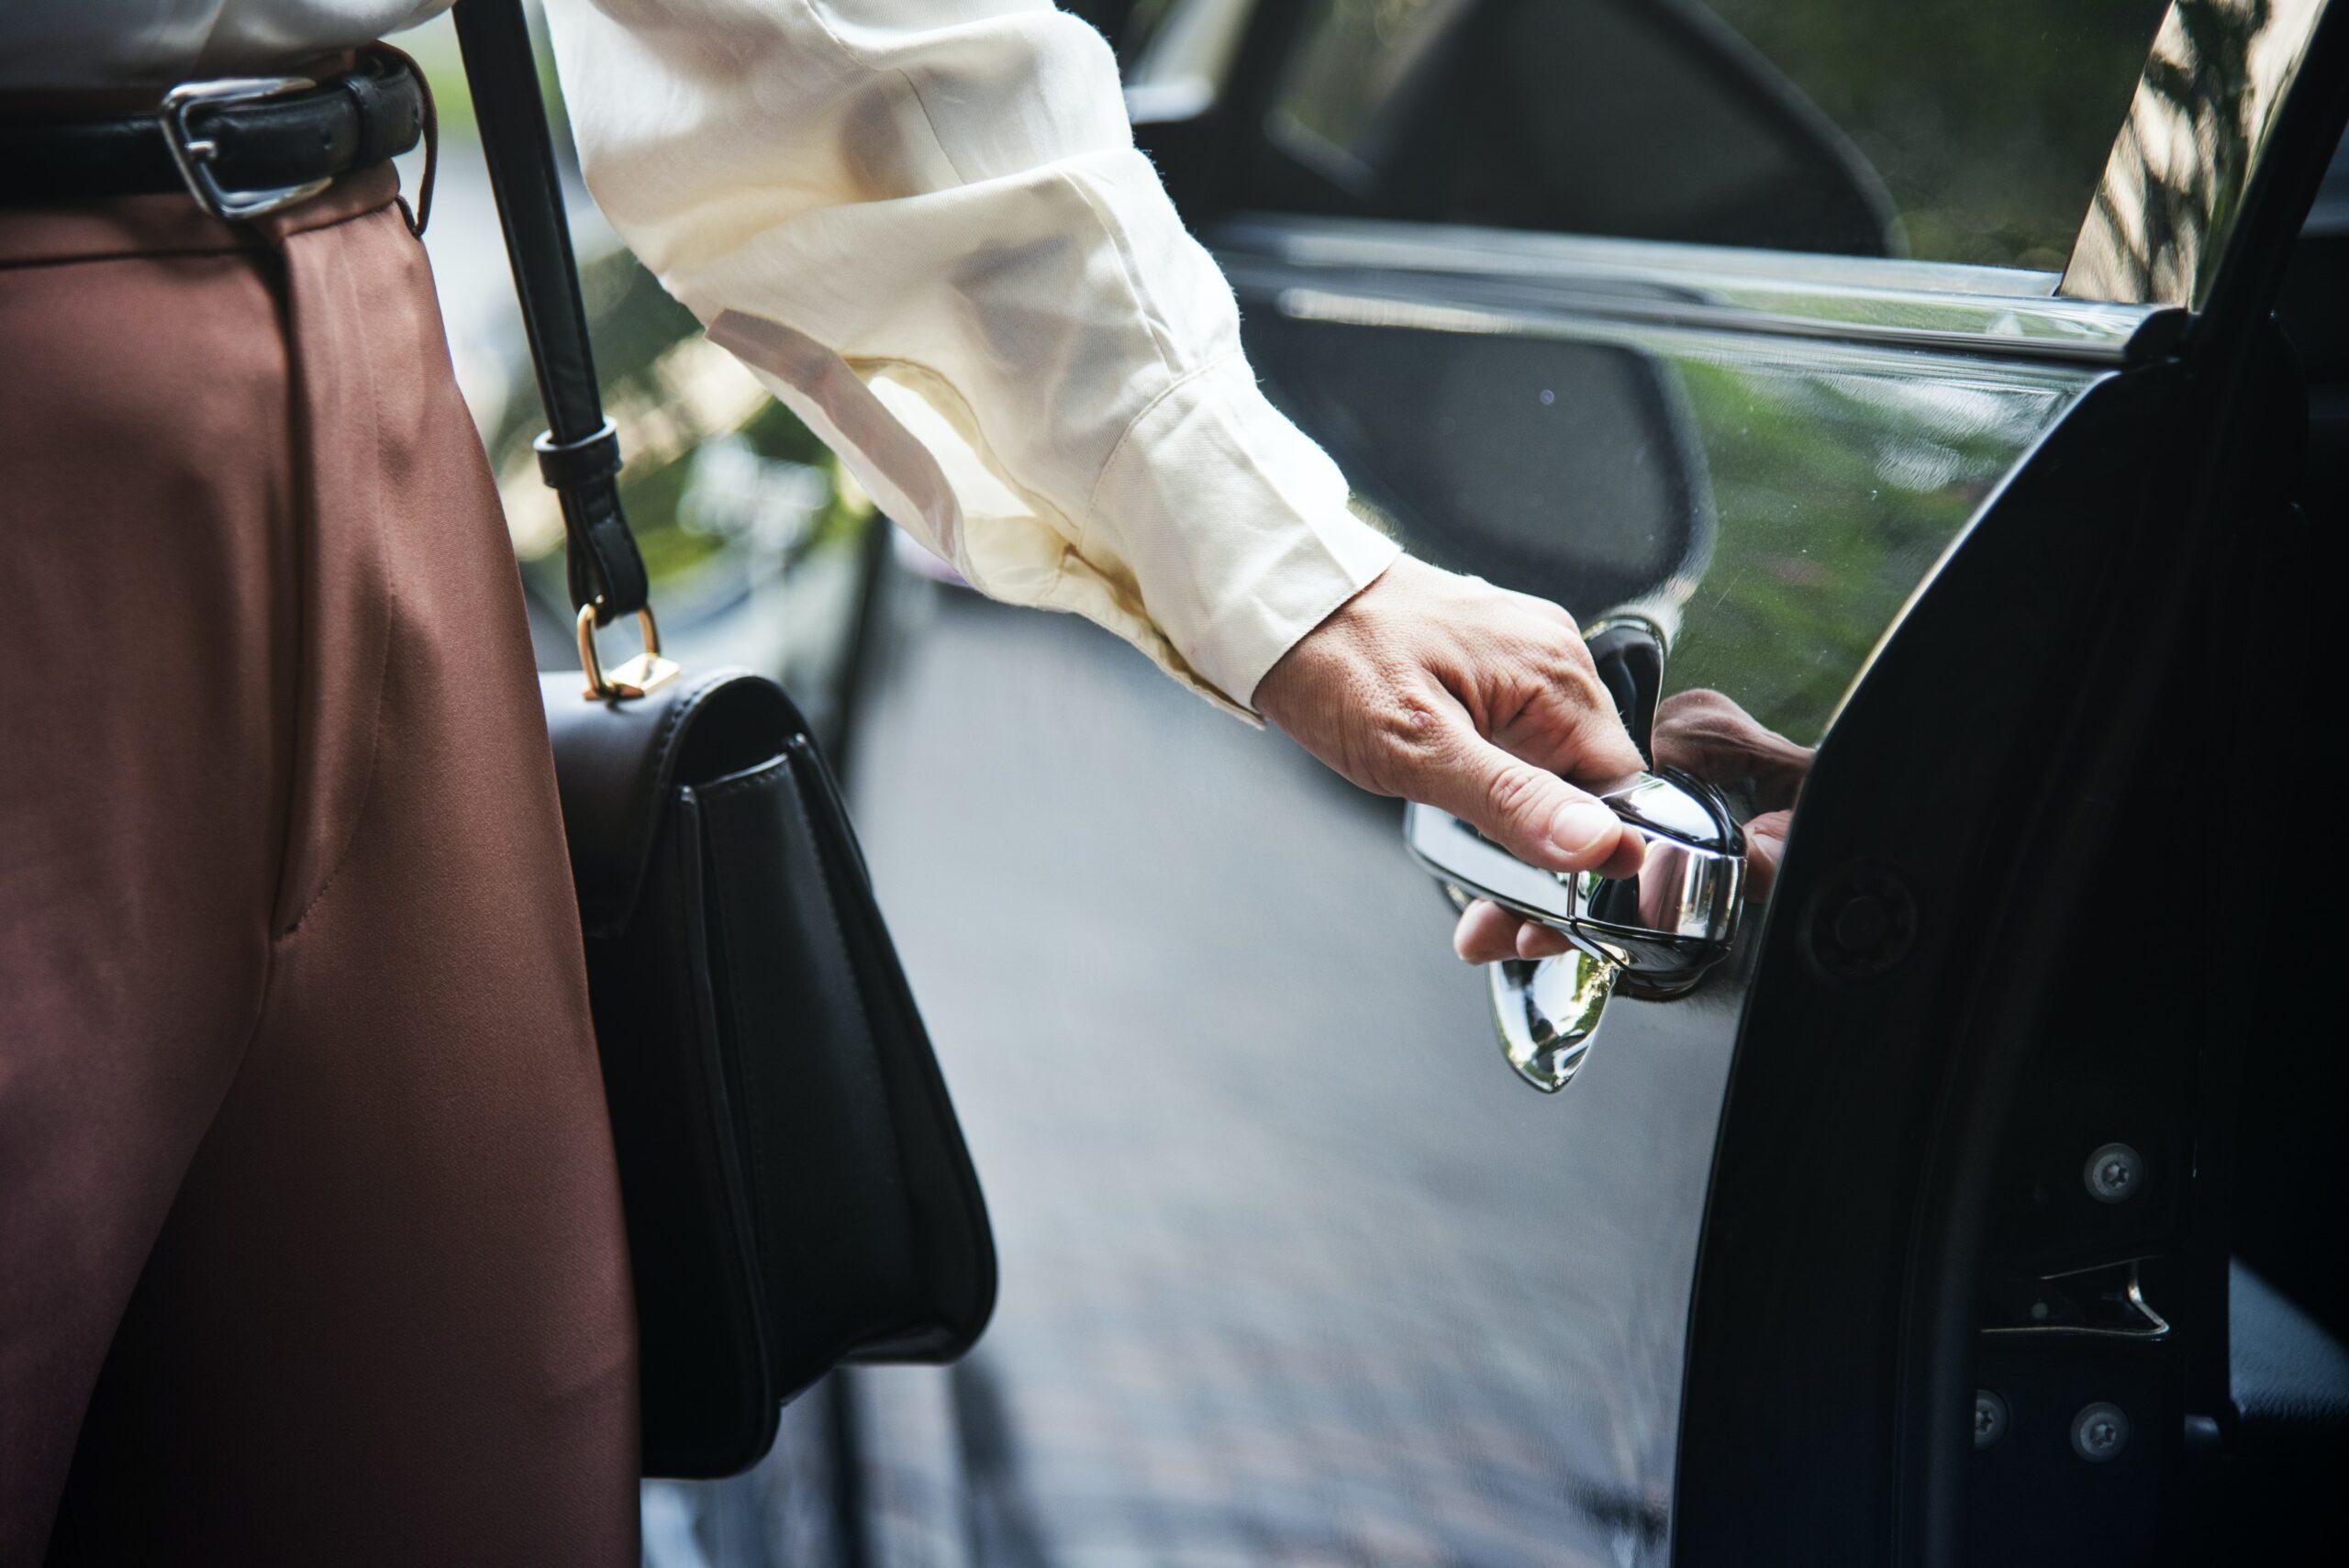 Close up shot of person opening car door